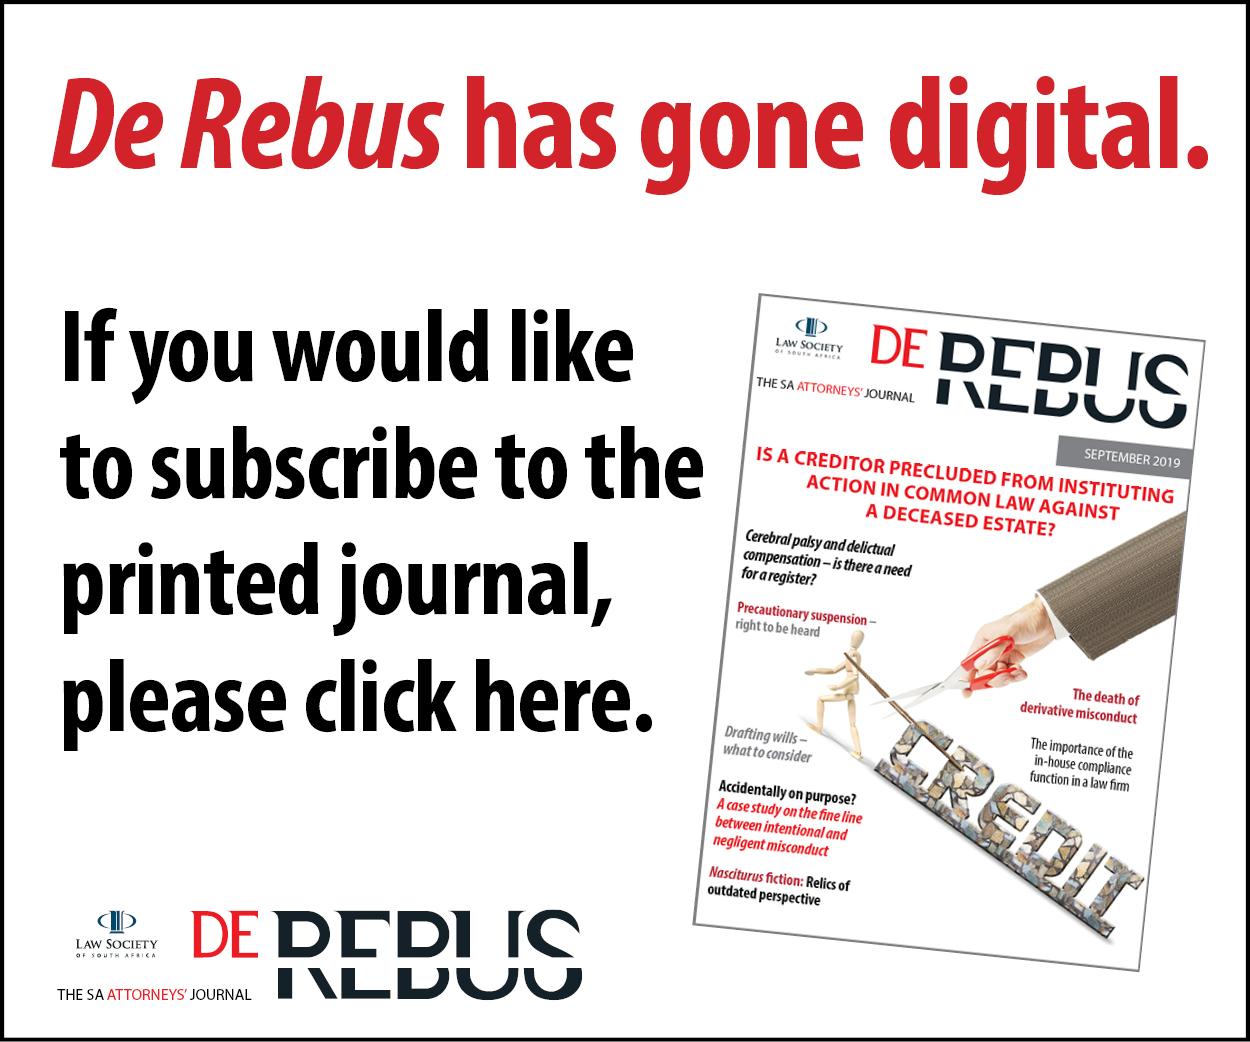 De Rebus - SA Attorneys' Journal